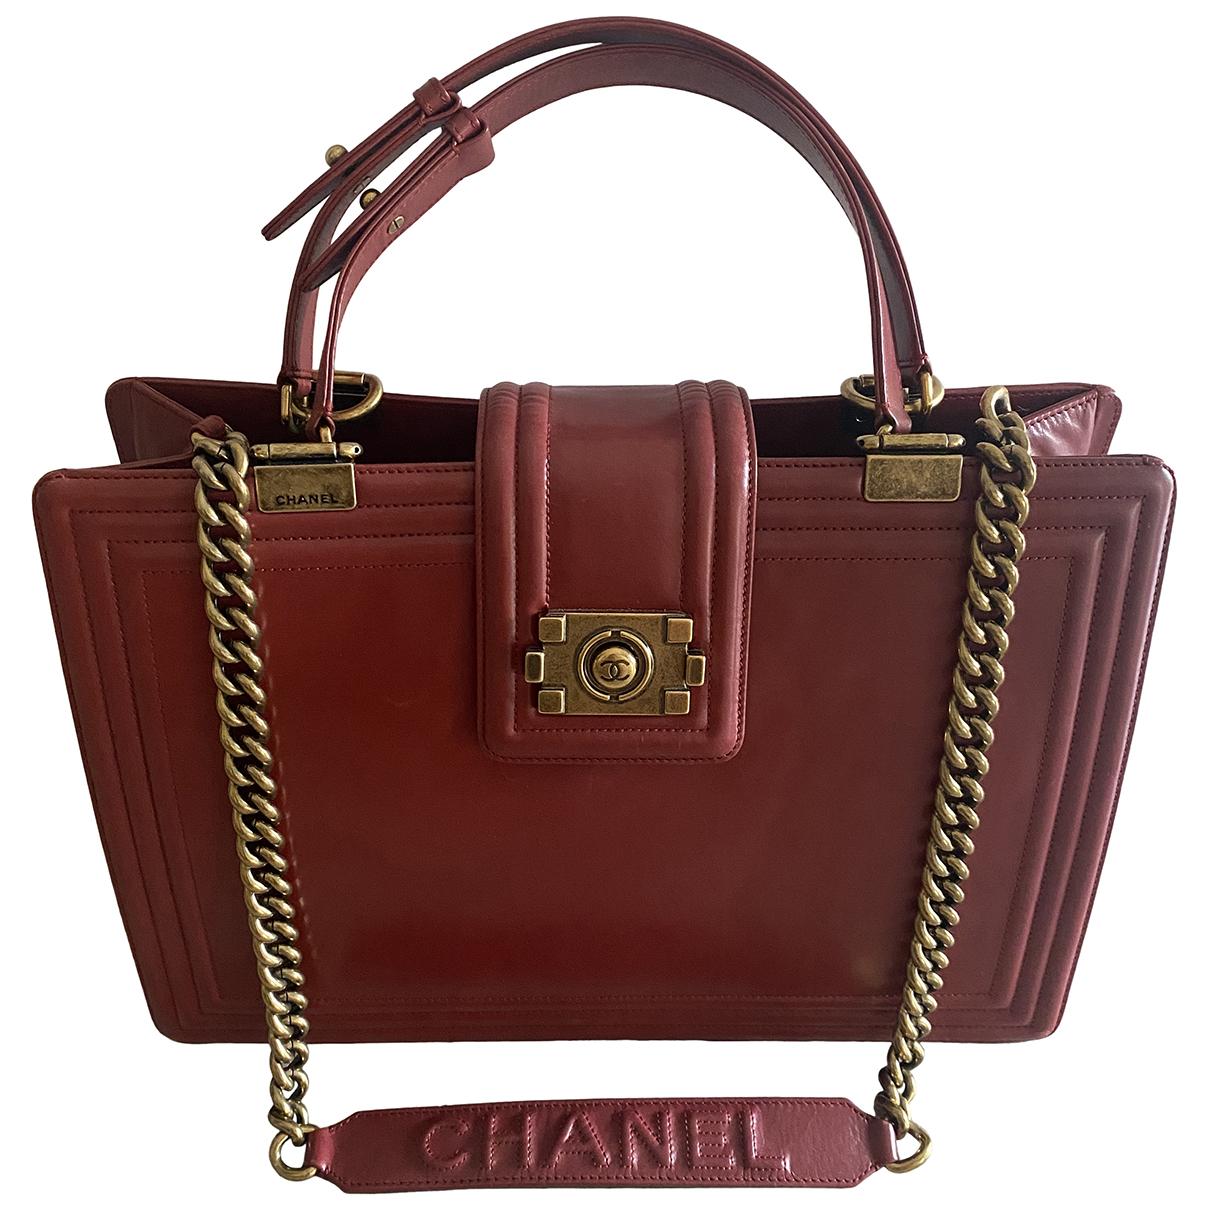 Chanel N Burgundy Leather handbag for Women N